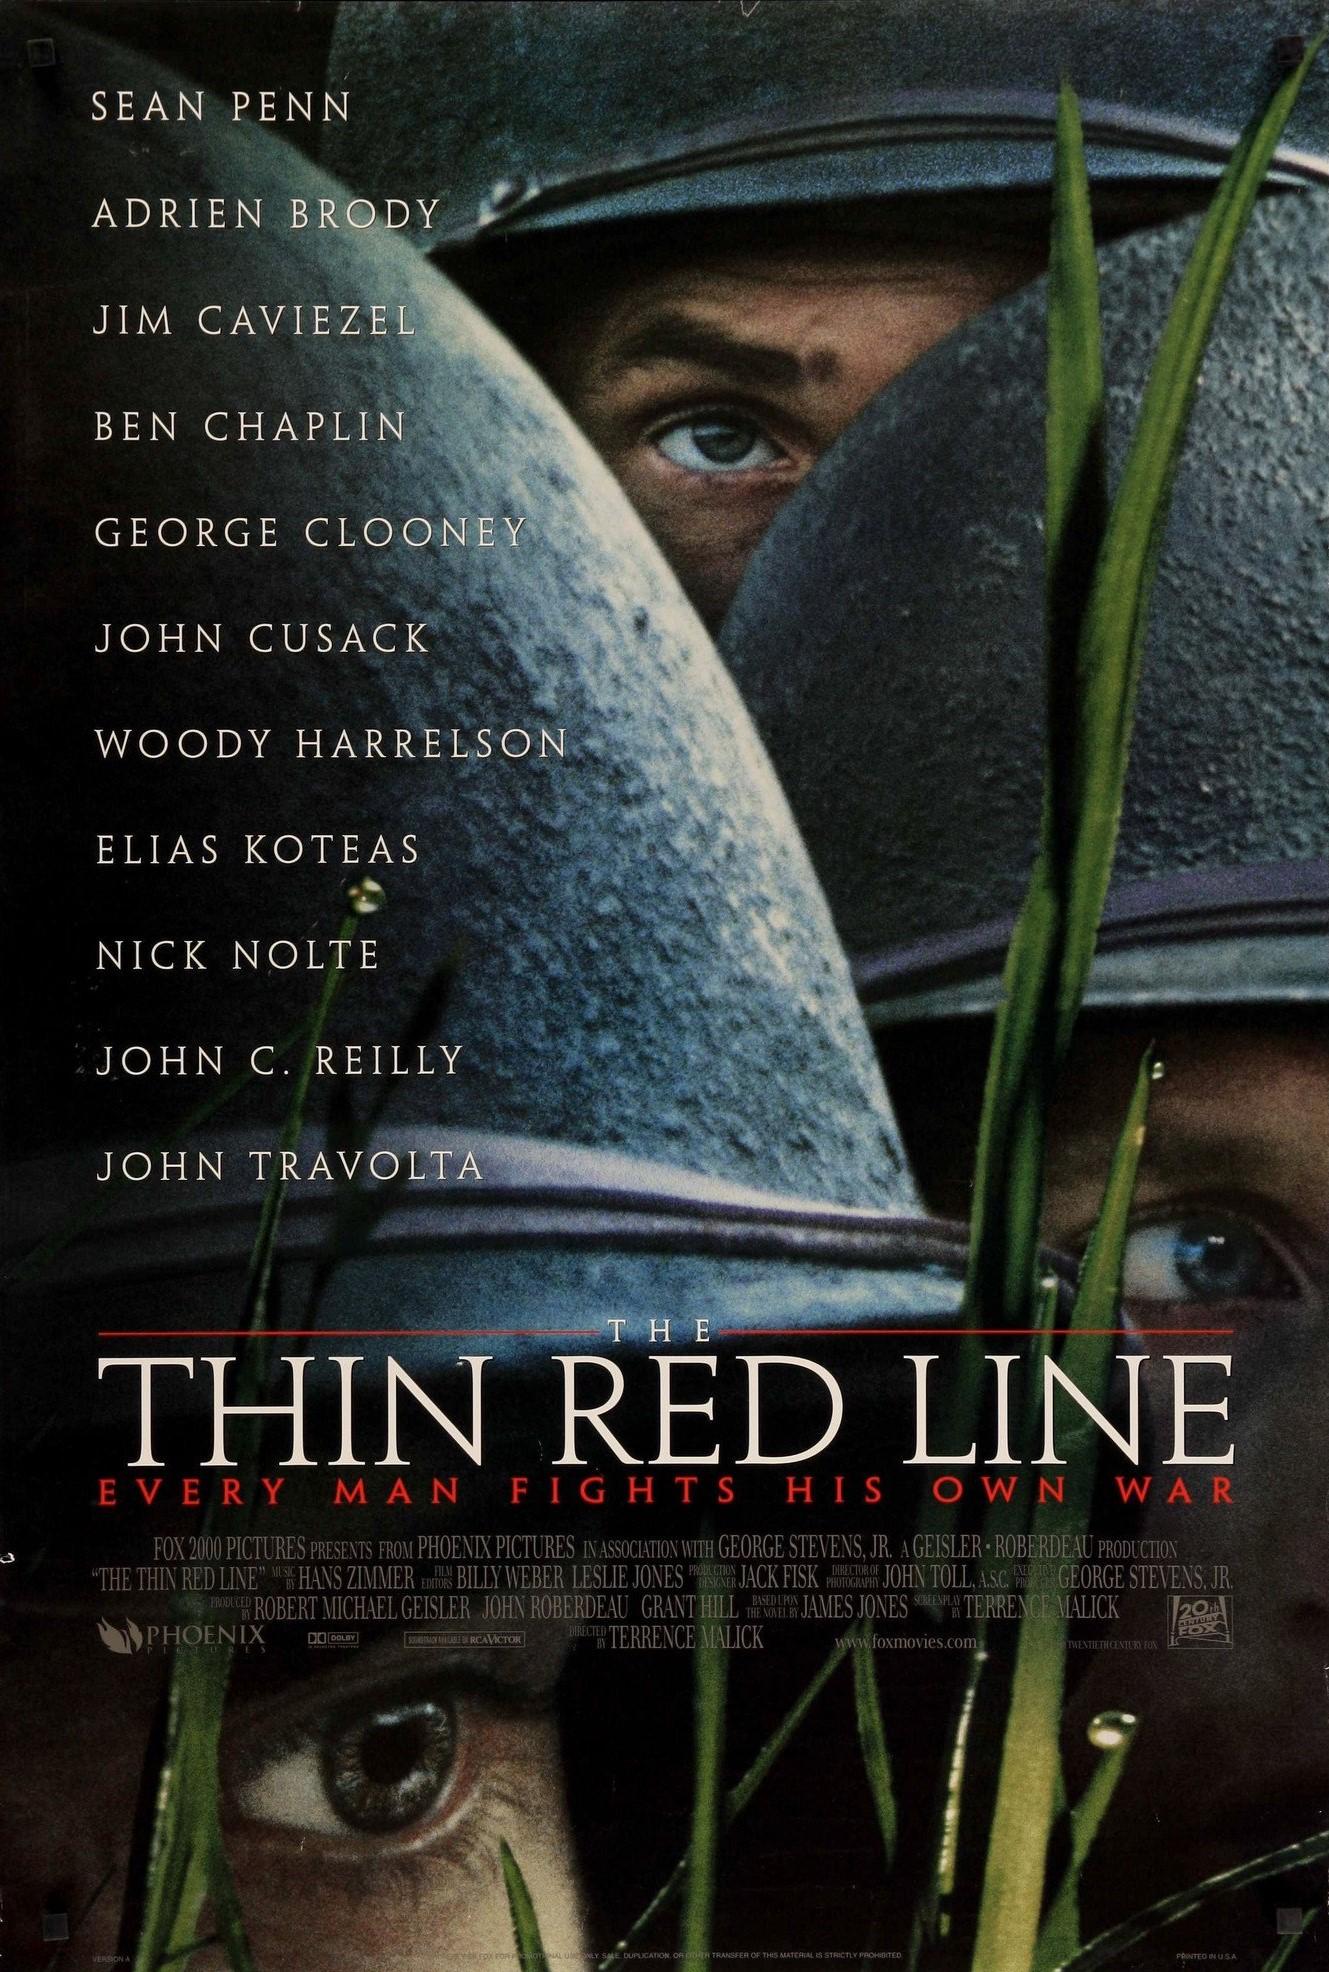 La delgada línea roja póster en.jpg